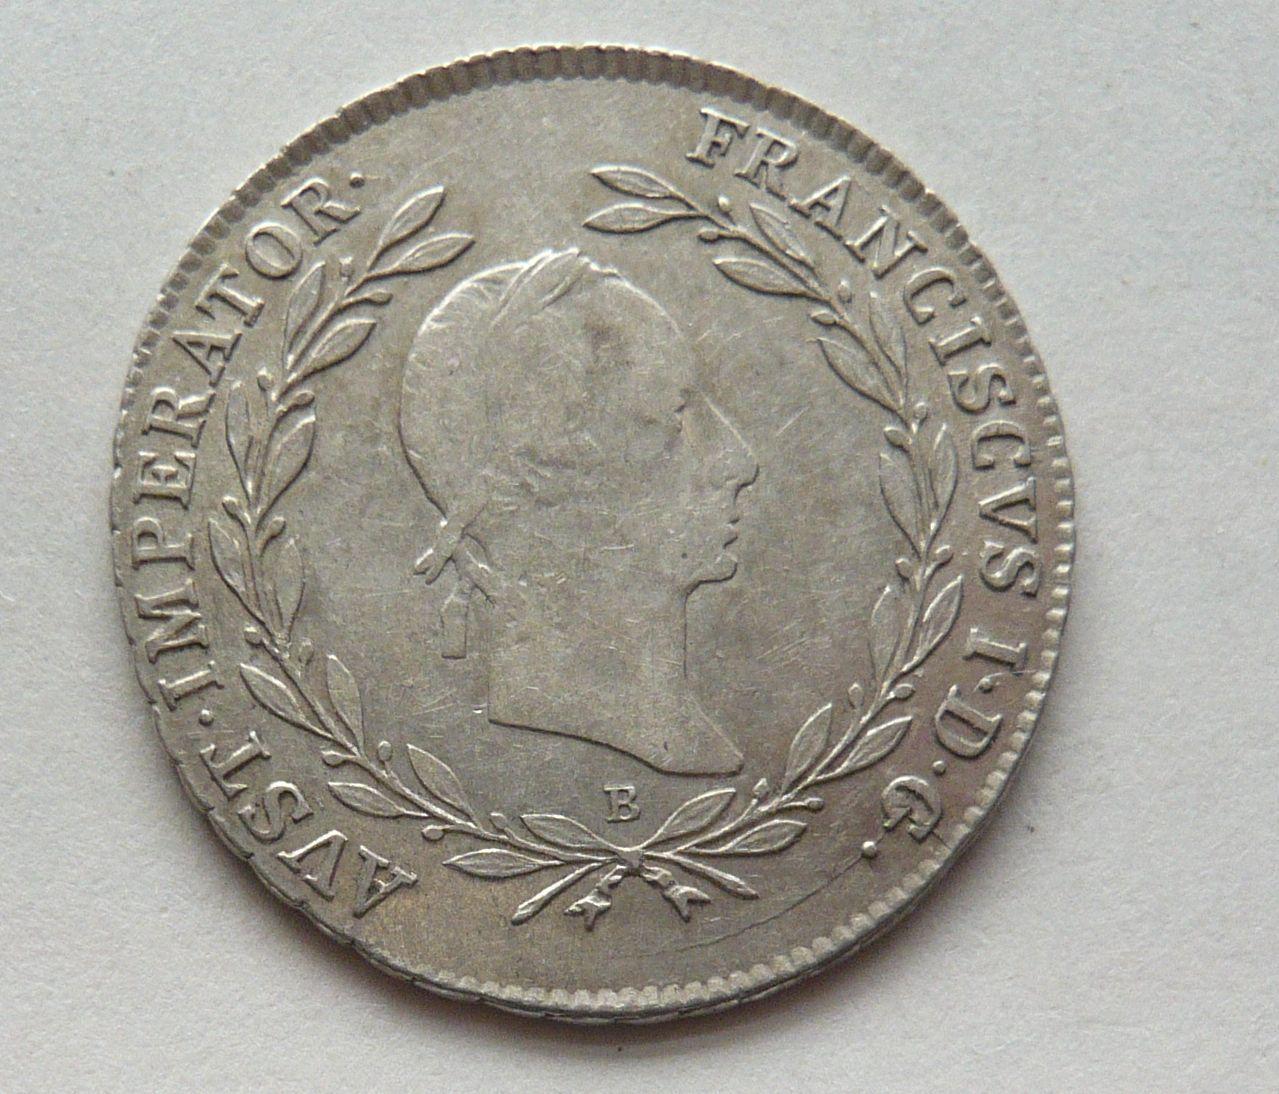 Uhry 20 Krejcar znak 1830 B František II.